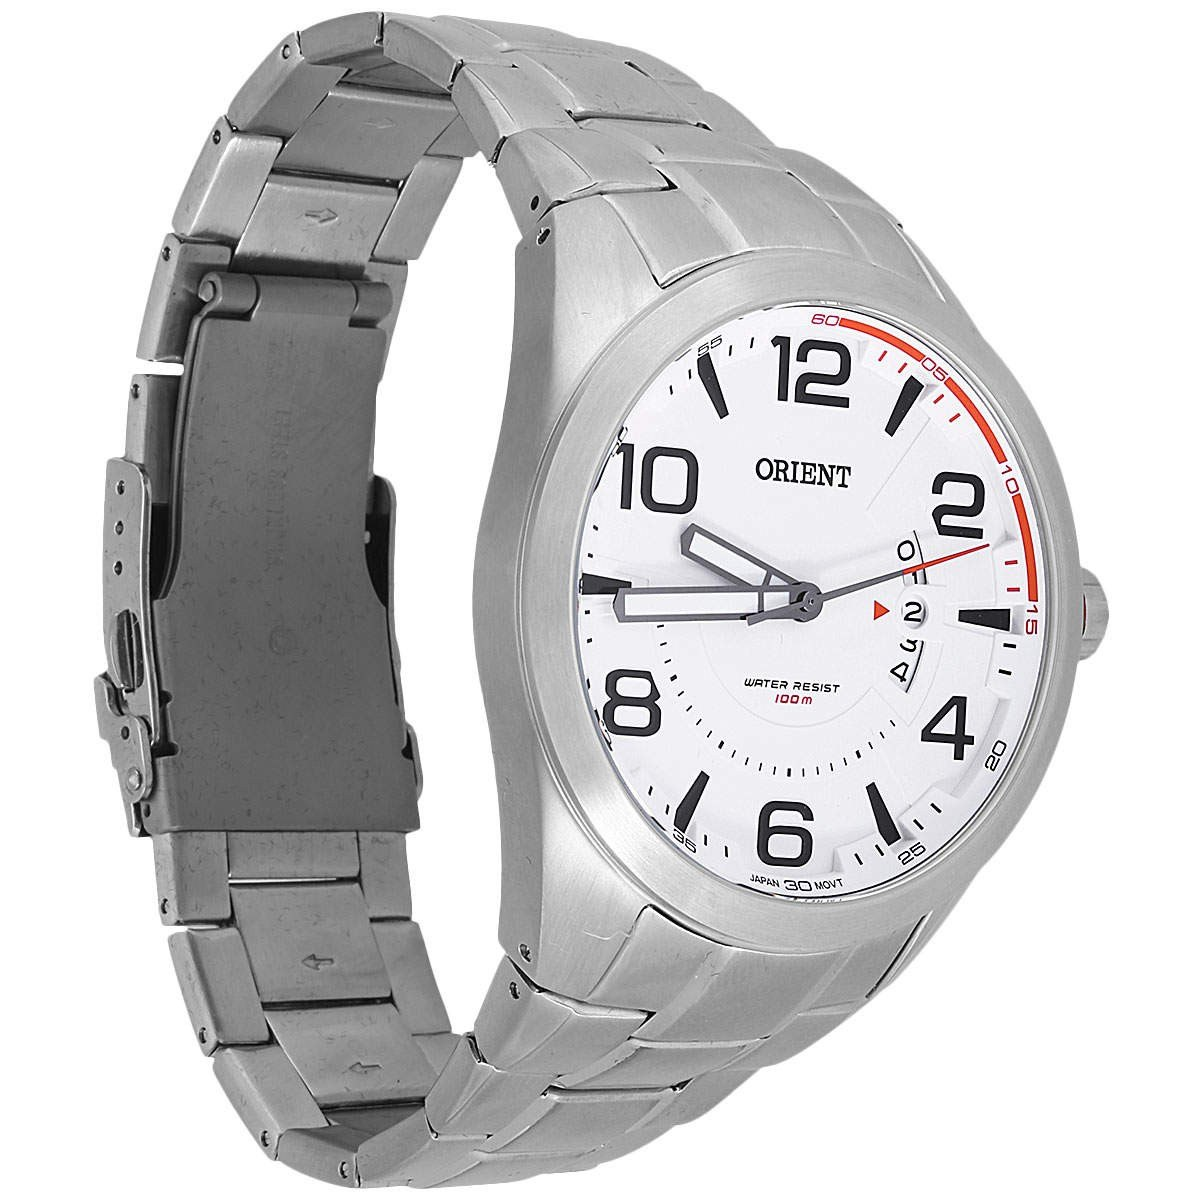 cbadf91b12b Carregando zoom... relógio orient mbss1232 masculino sport mostrador branco